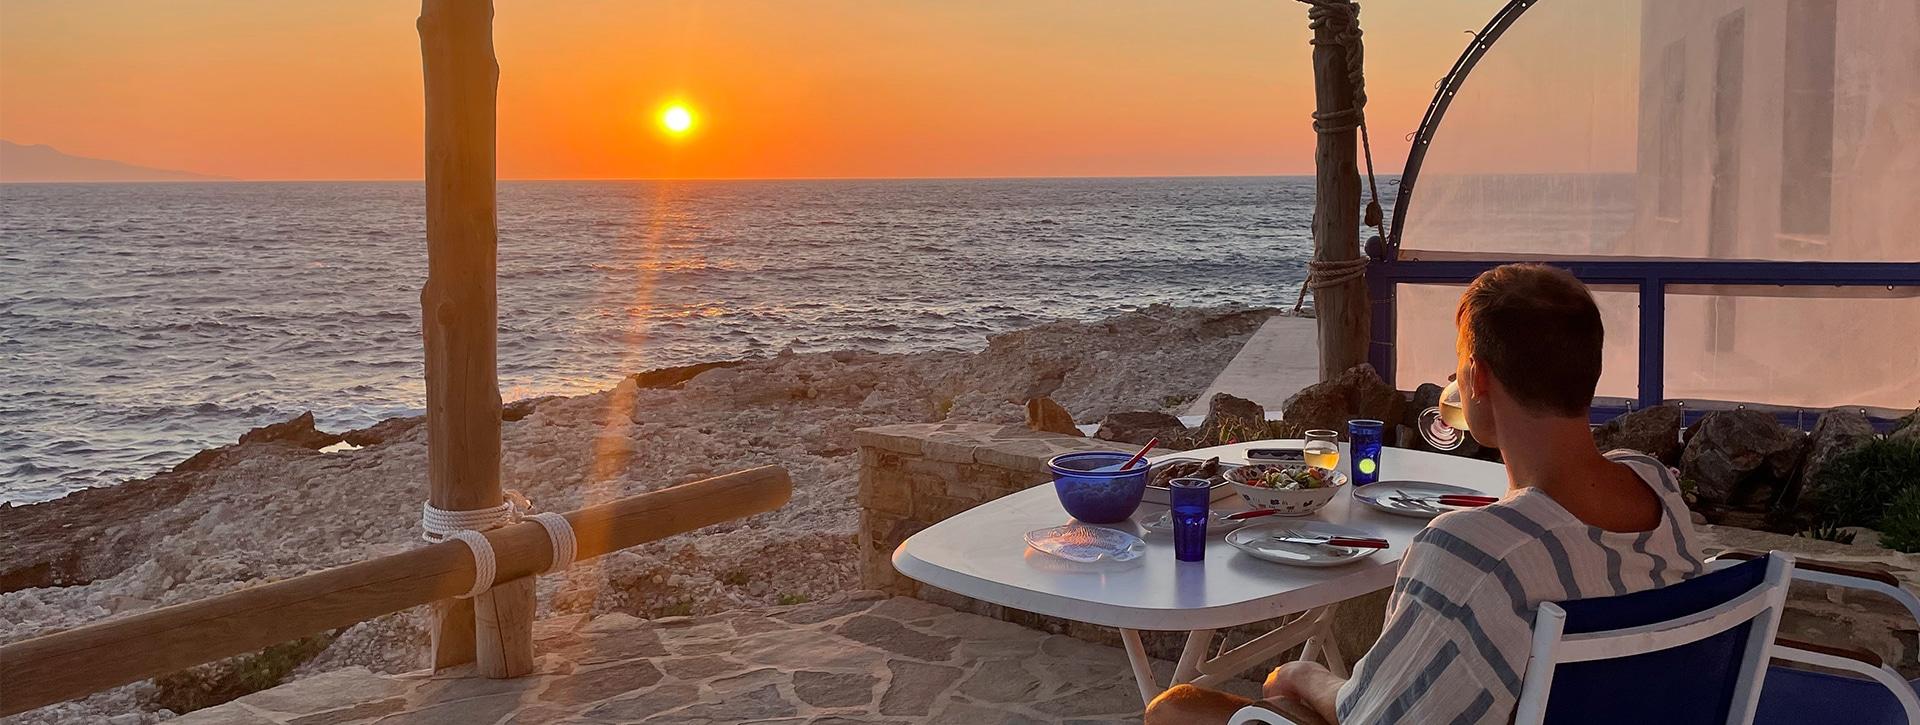 Your Own Peninsula in Samos, Greece